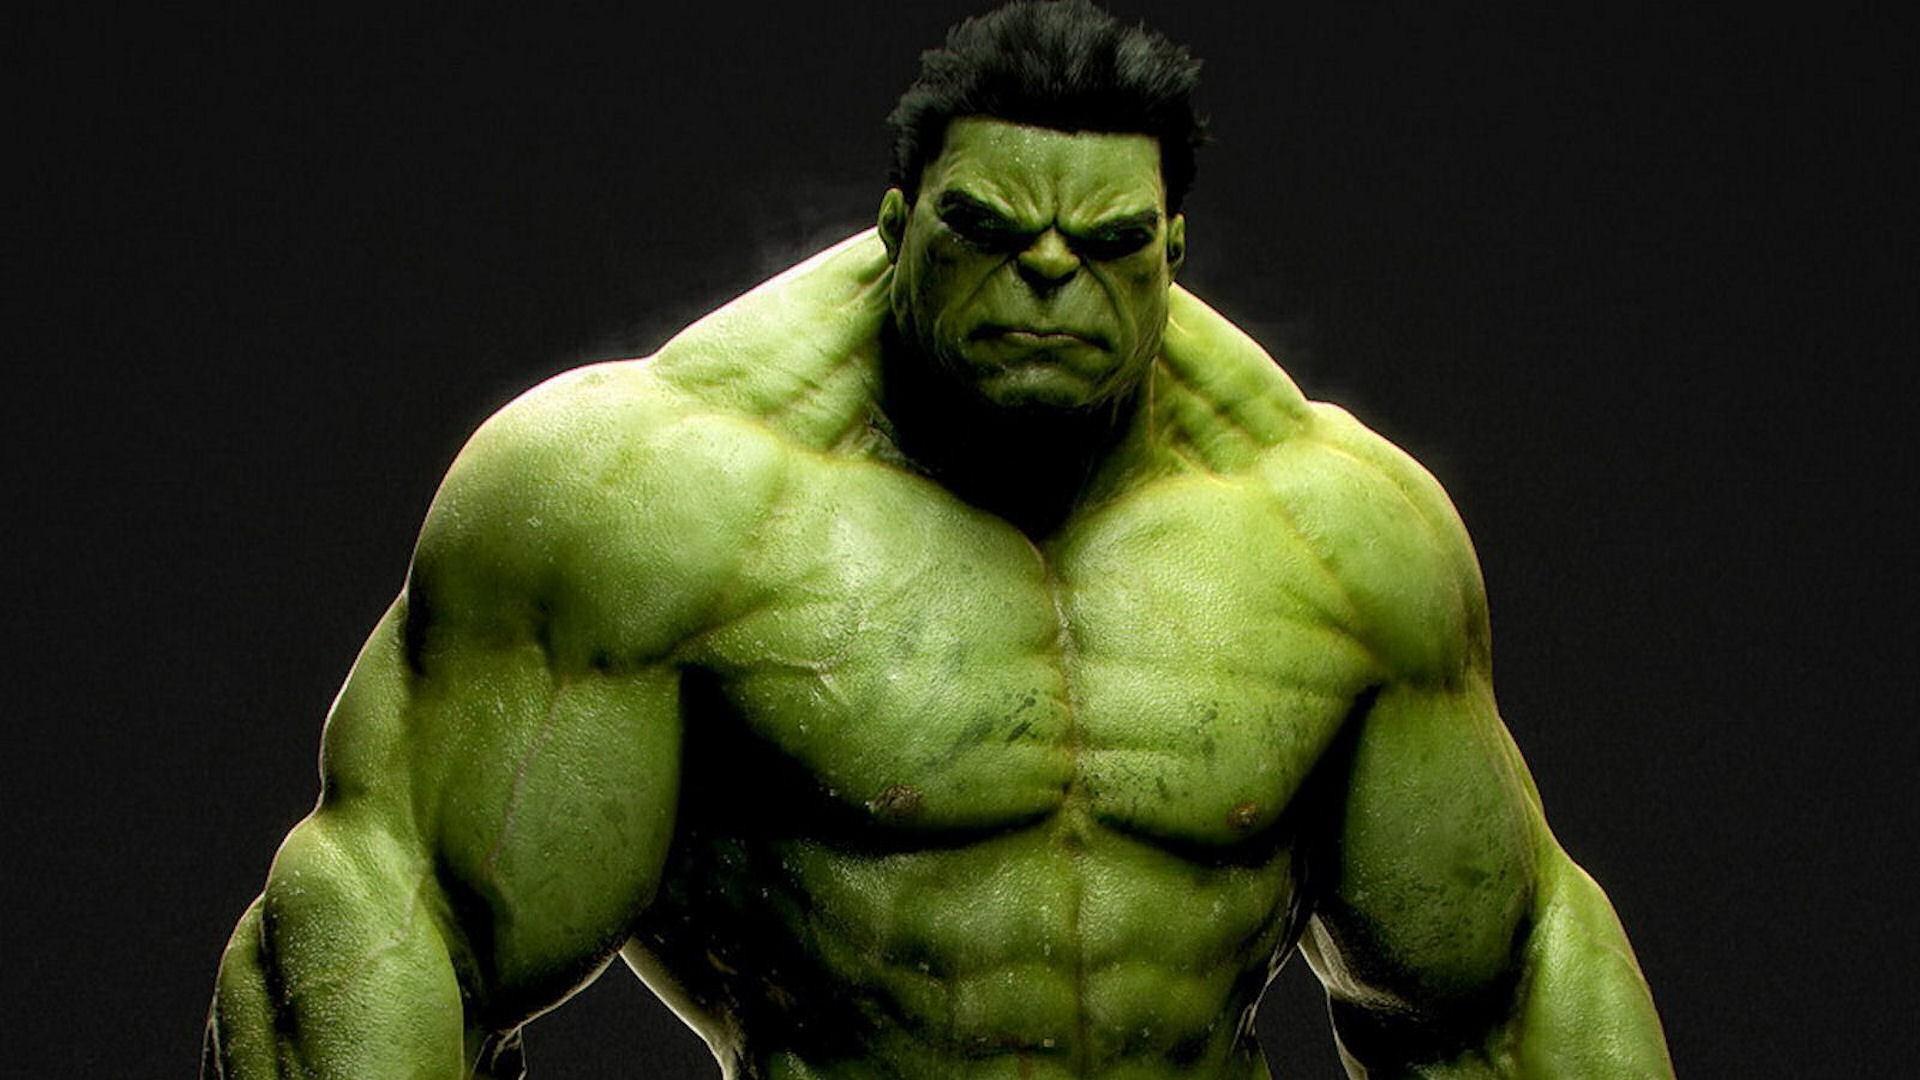 HD Hulk Wallpaper February